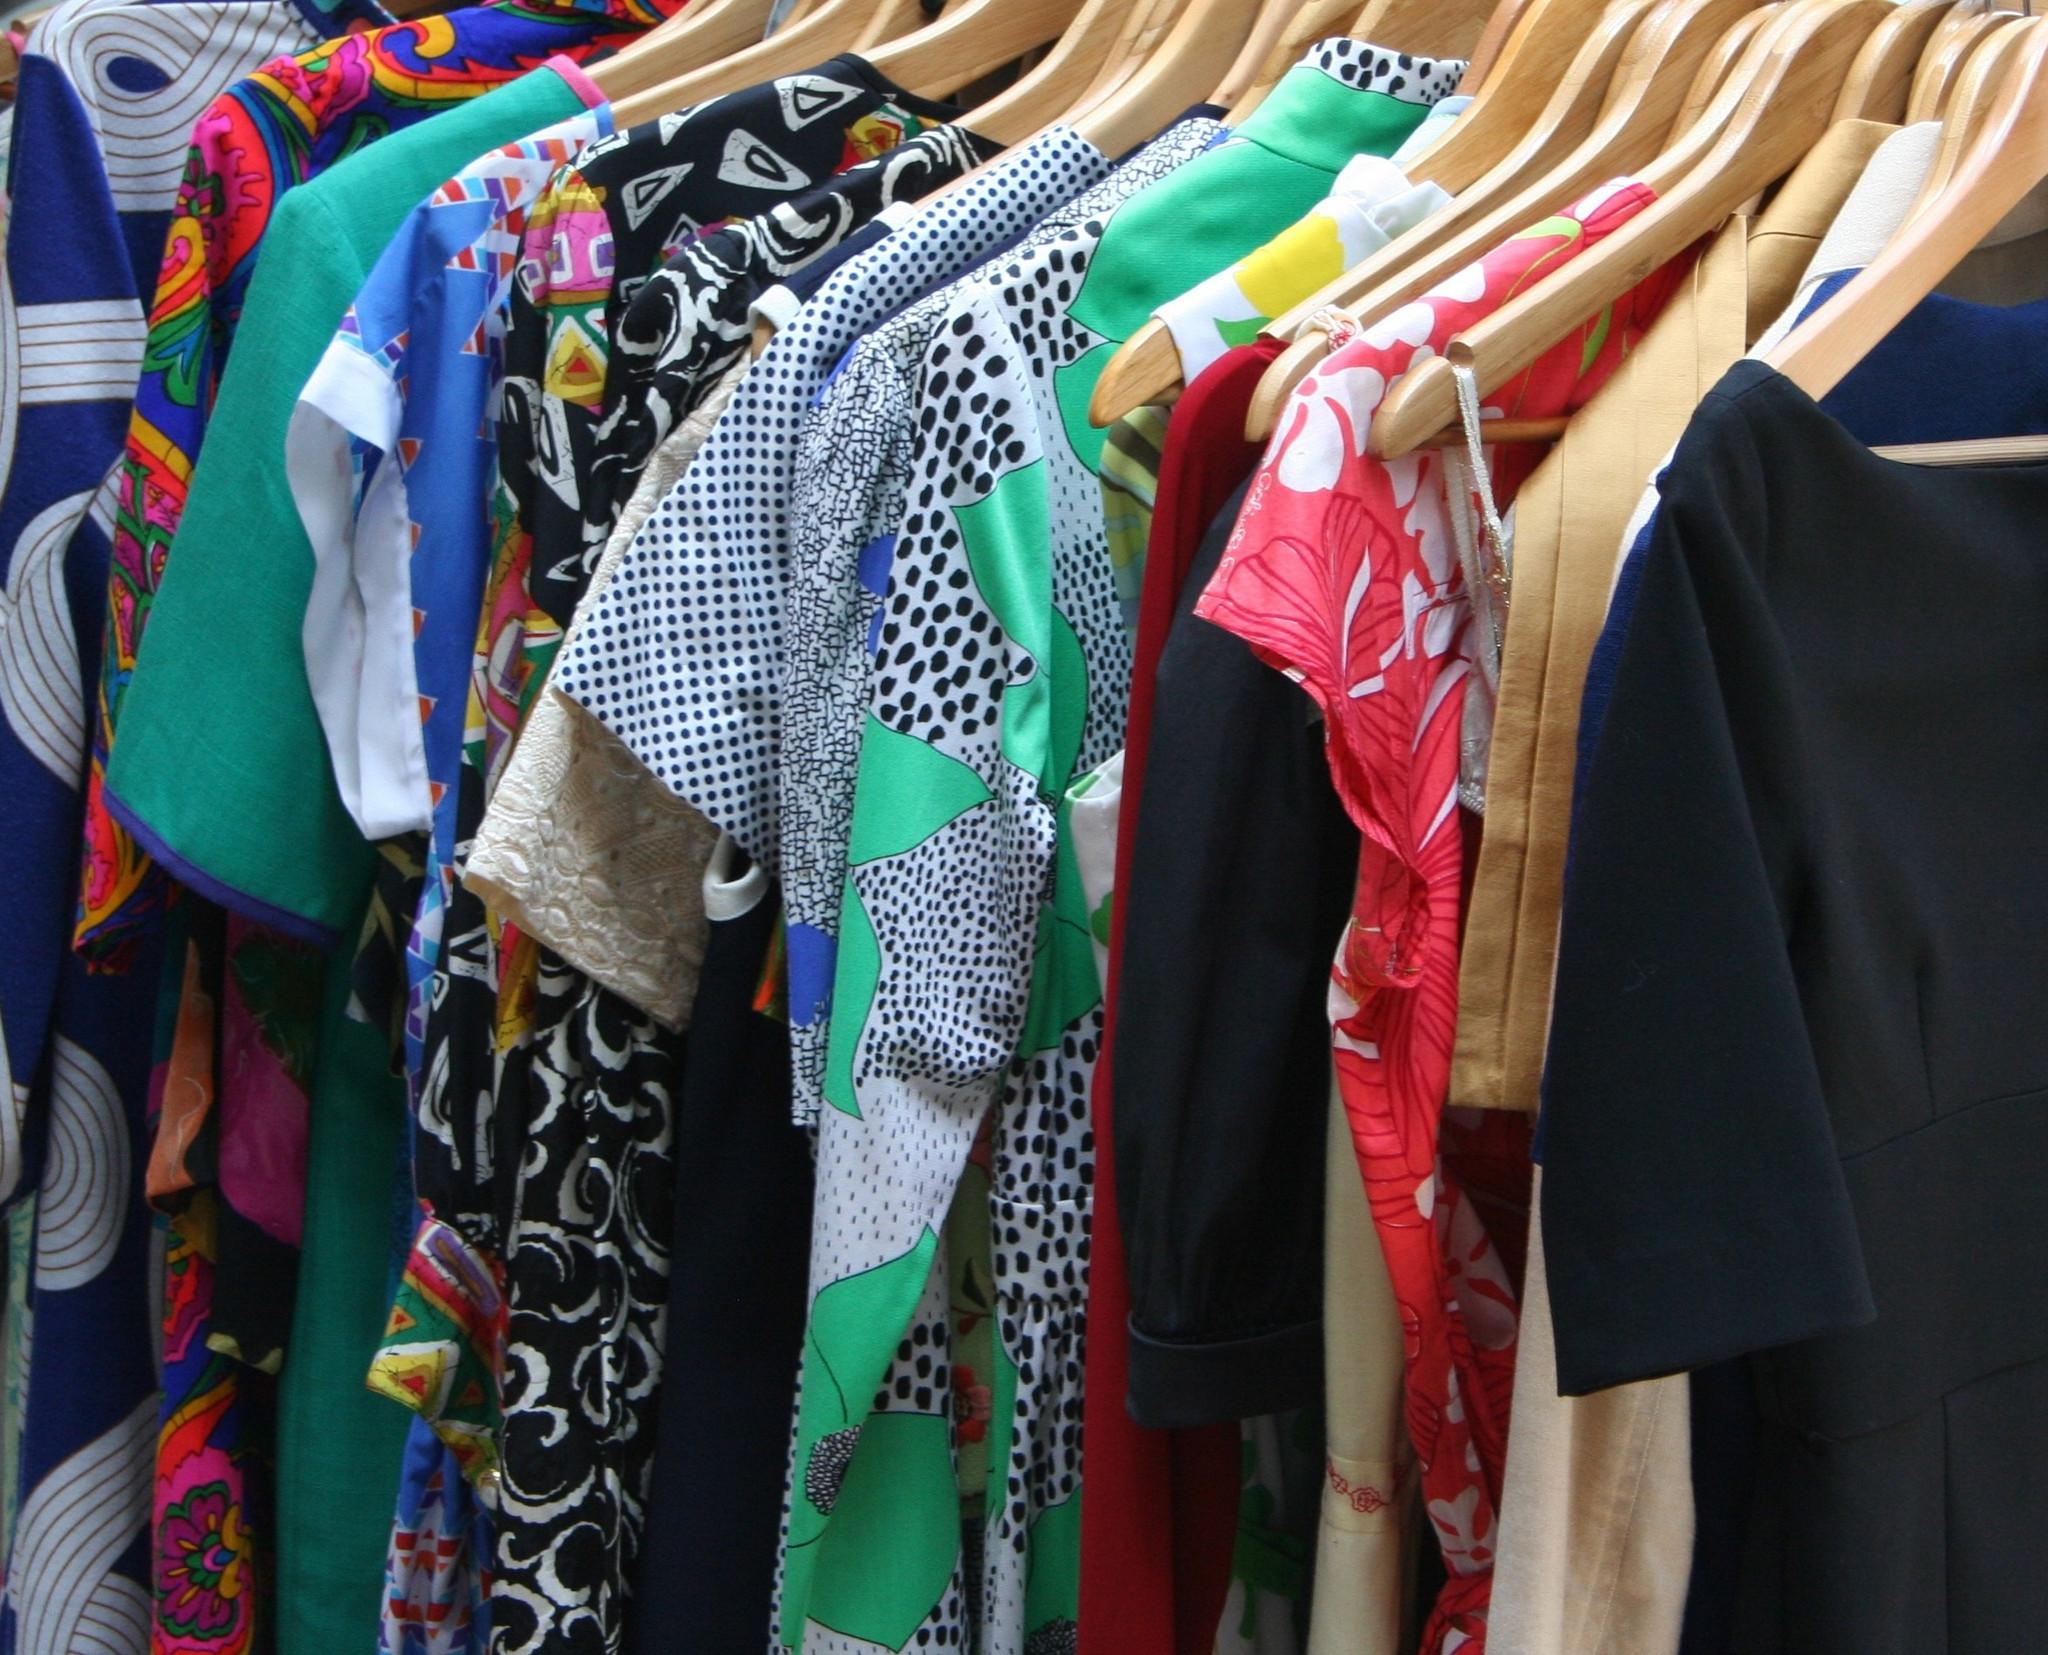 dresses-53319.jpg